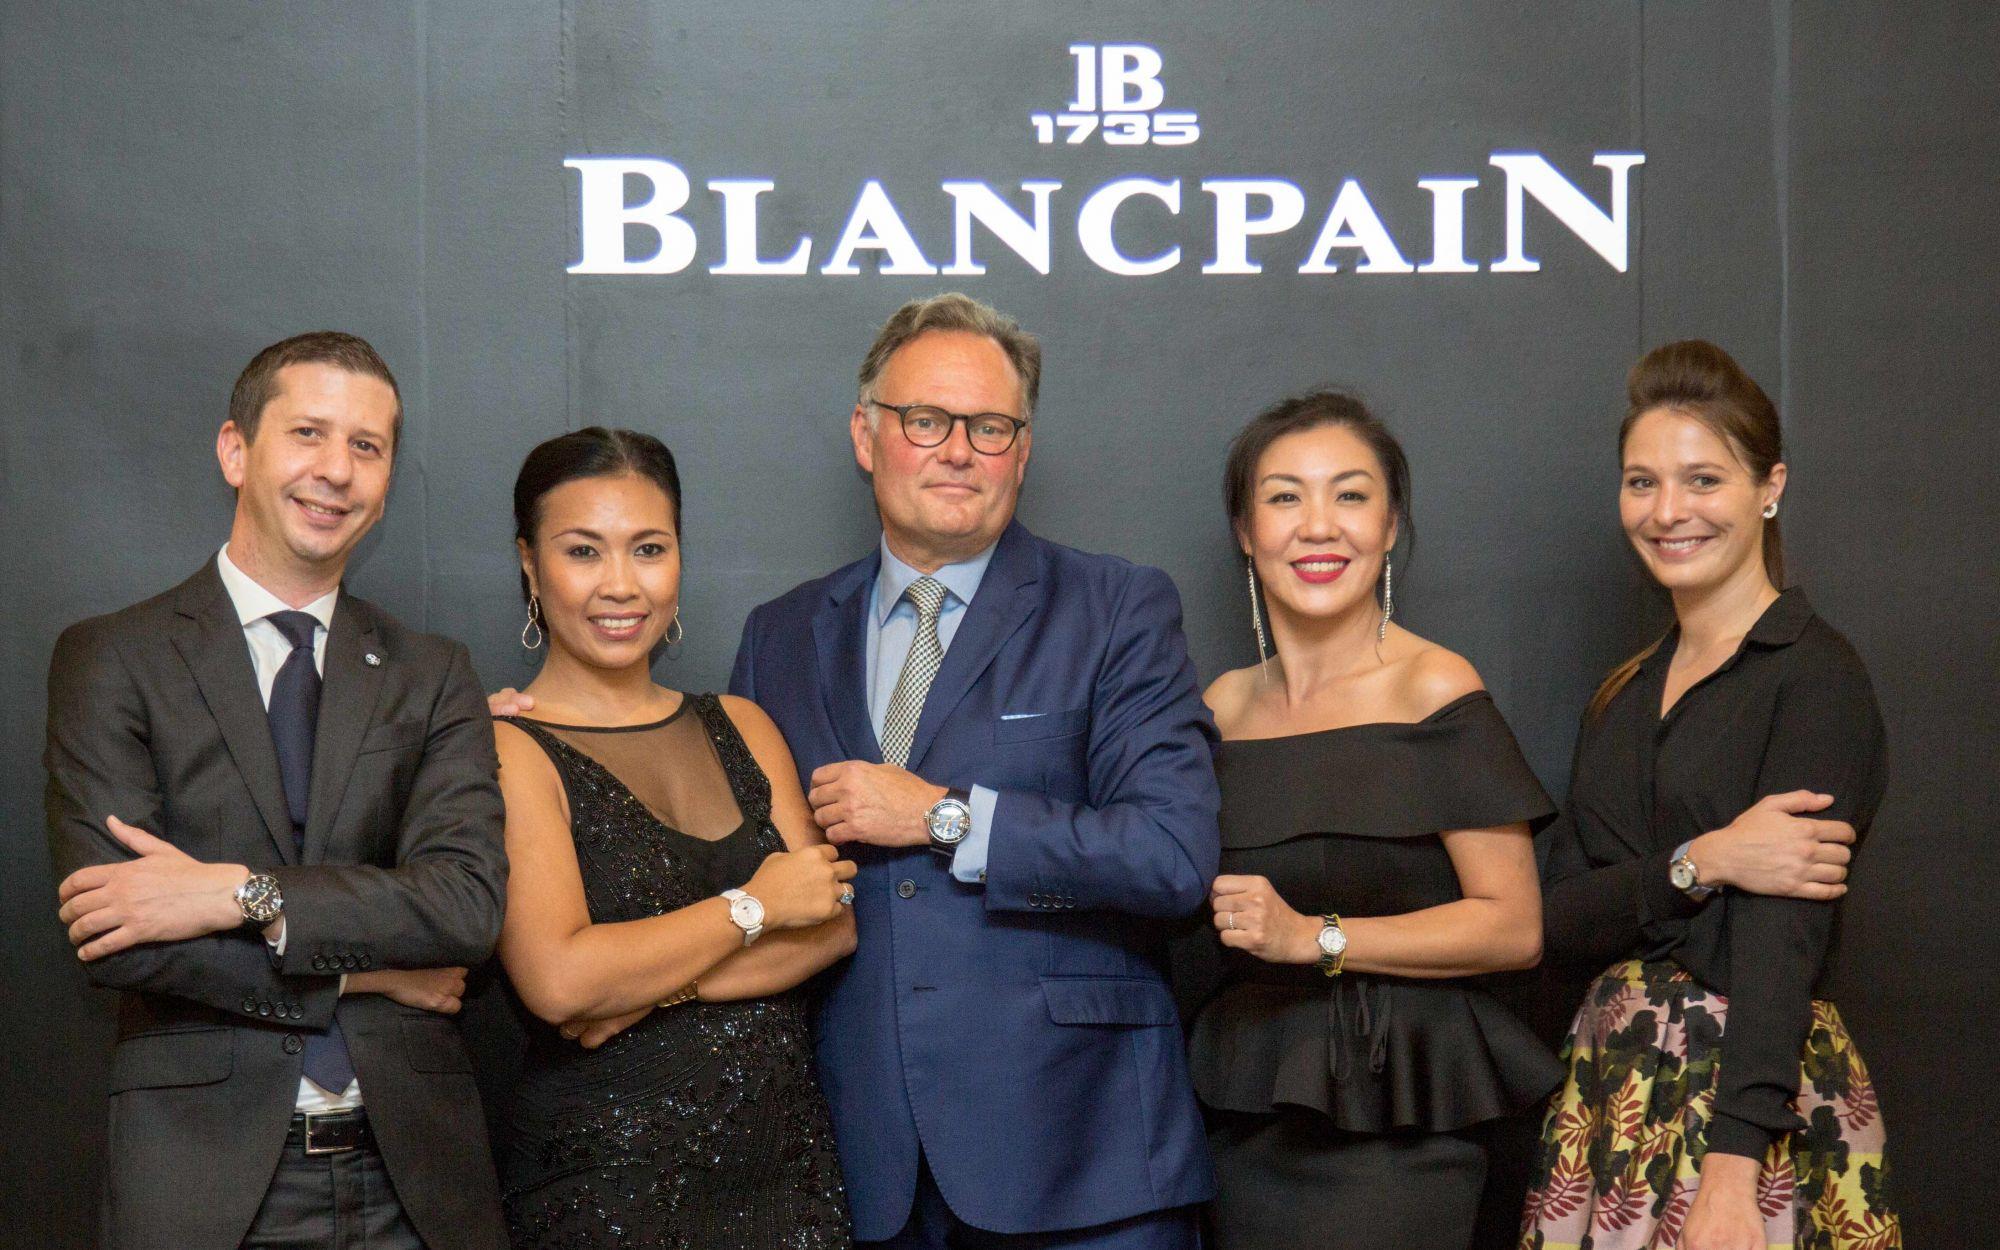 Jalil El Kouch-Bordier, Emmy Tellier, Marc Junod, Priscilla Wee and Clémence Bonal